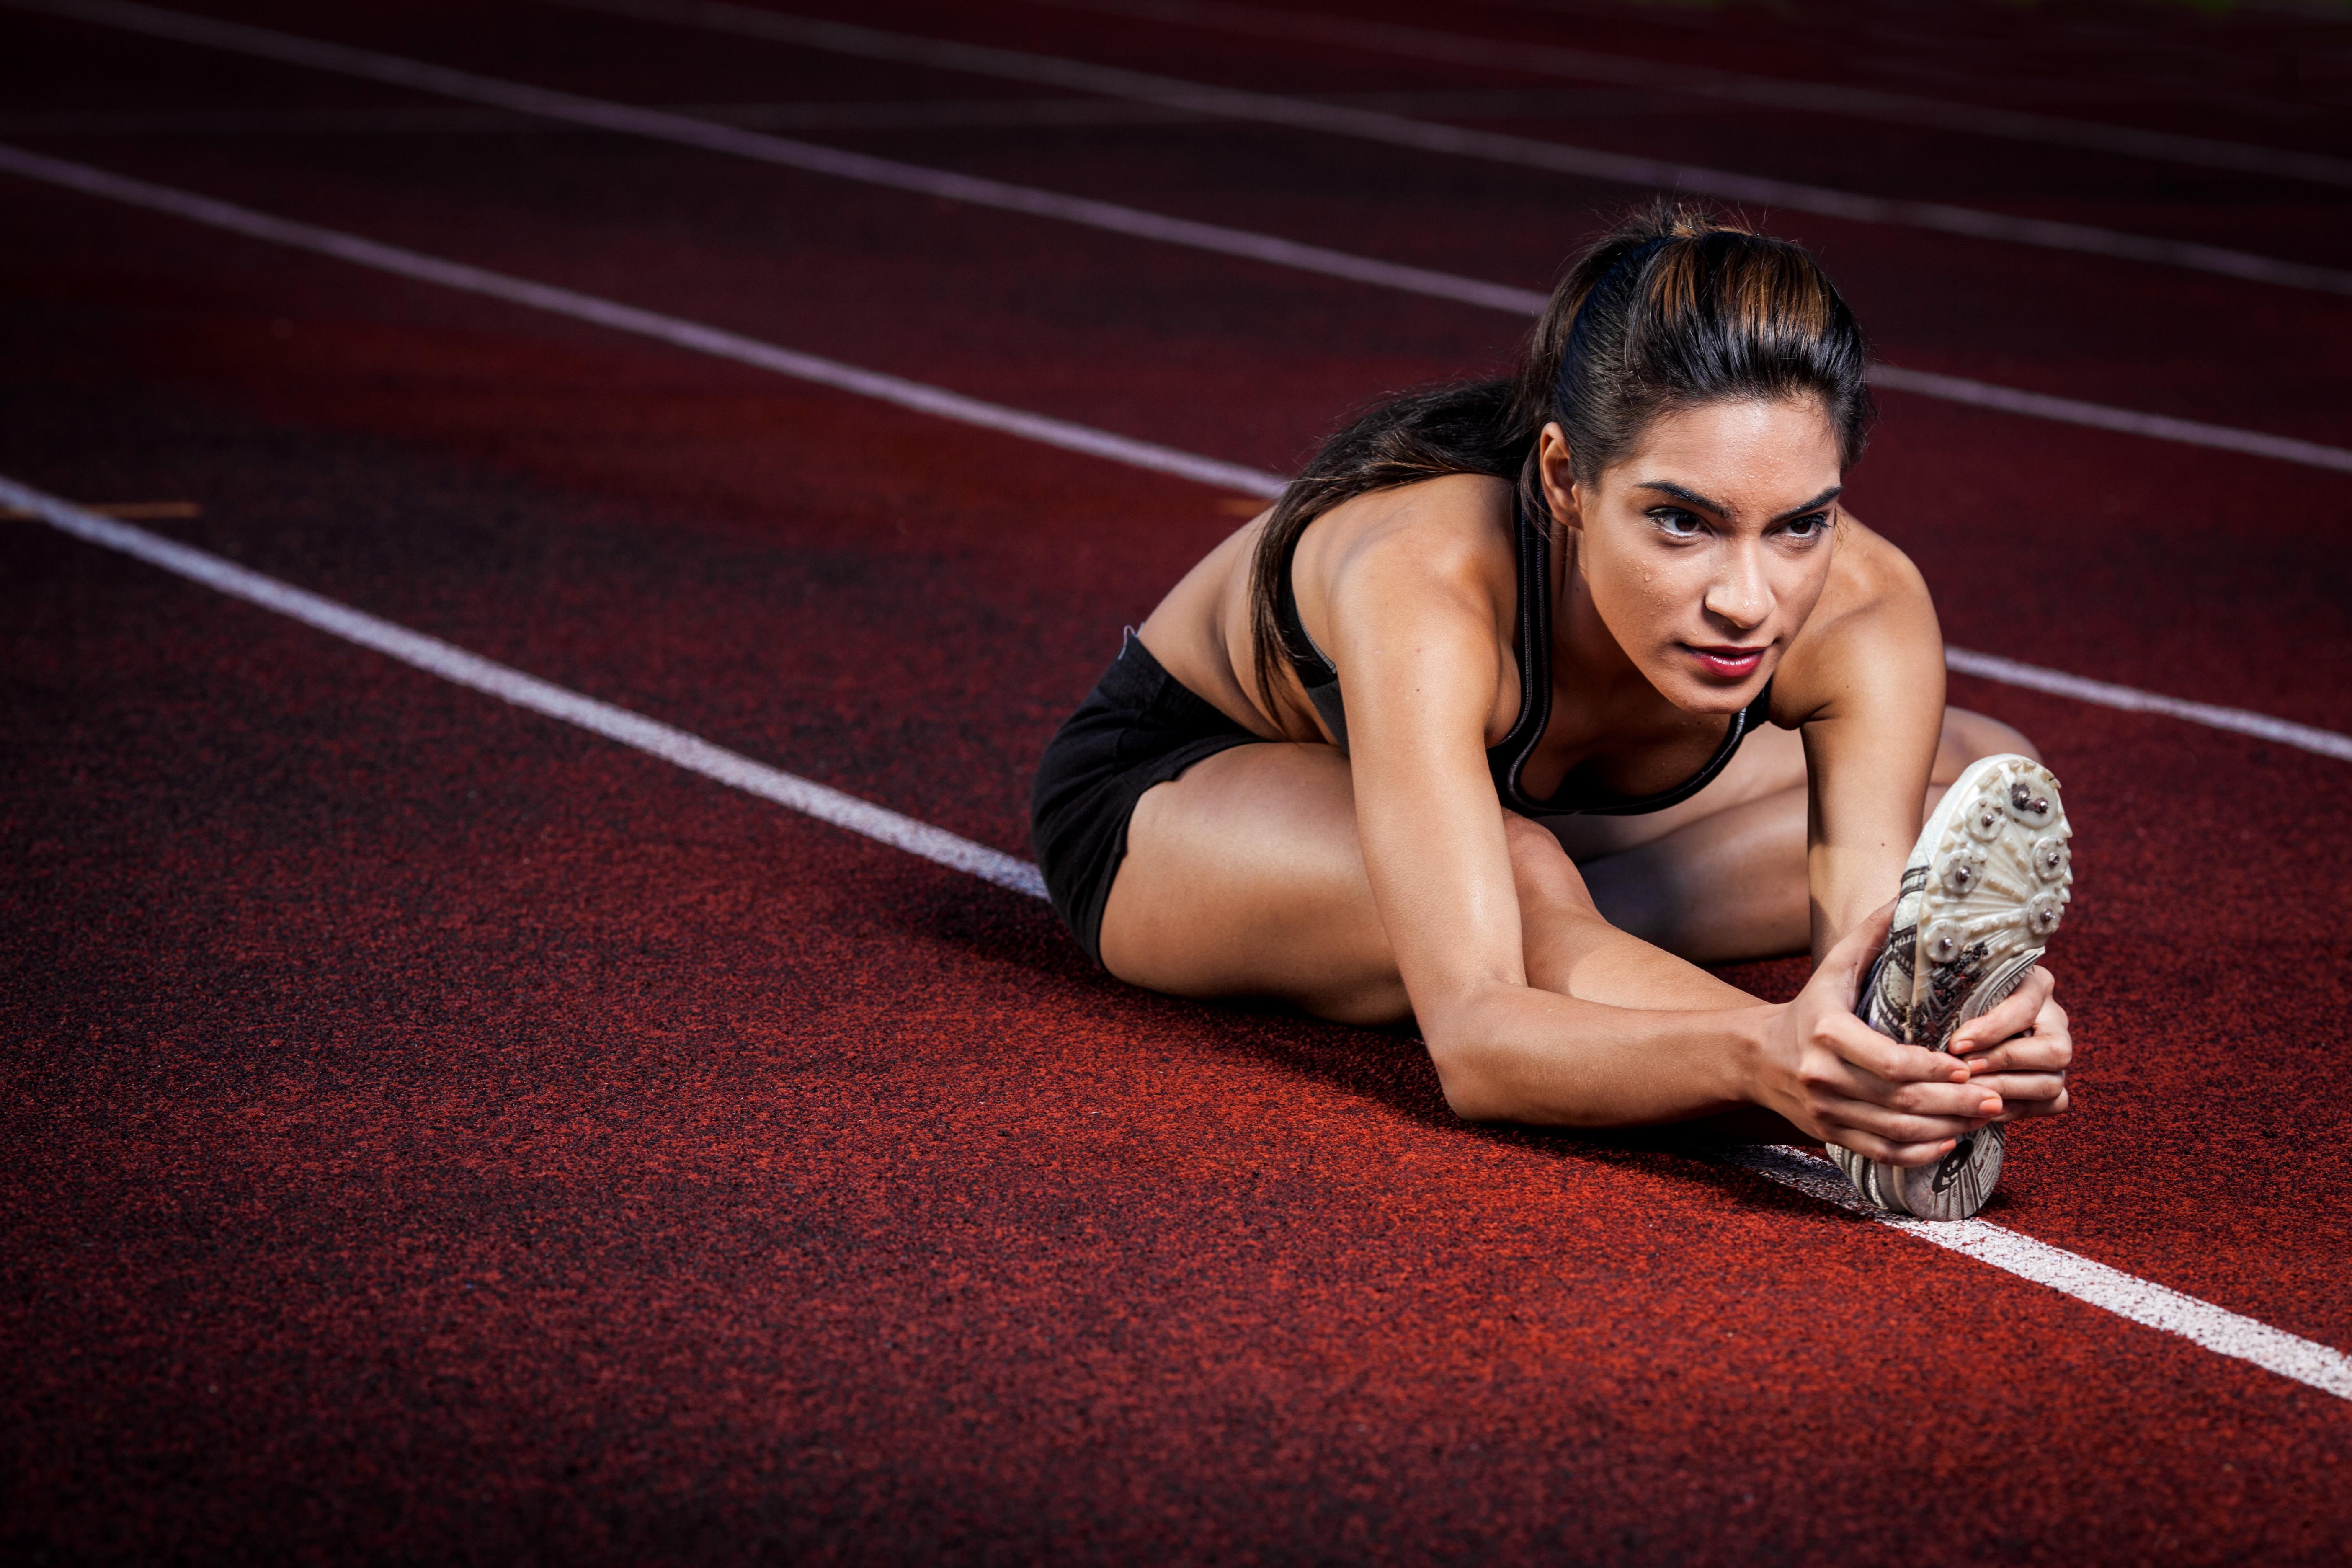 спорт фото девушек - 5